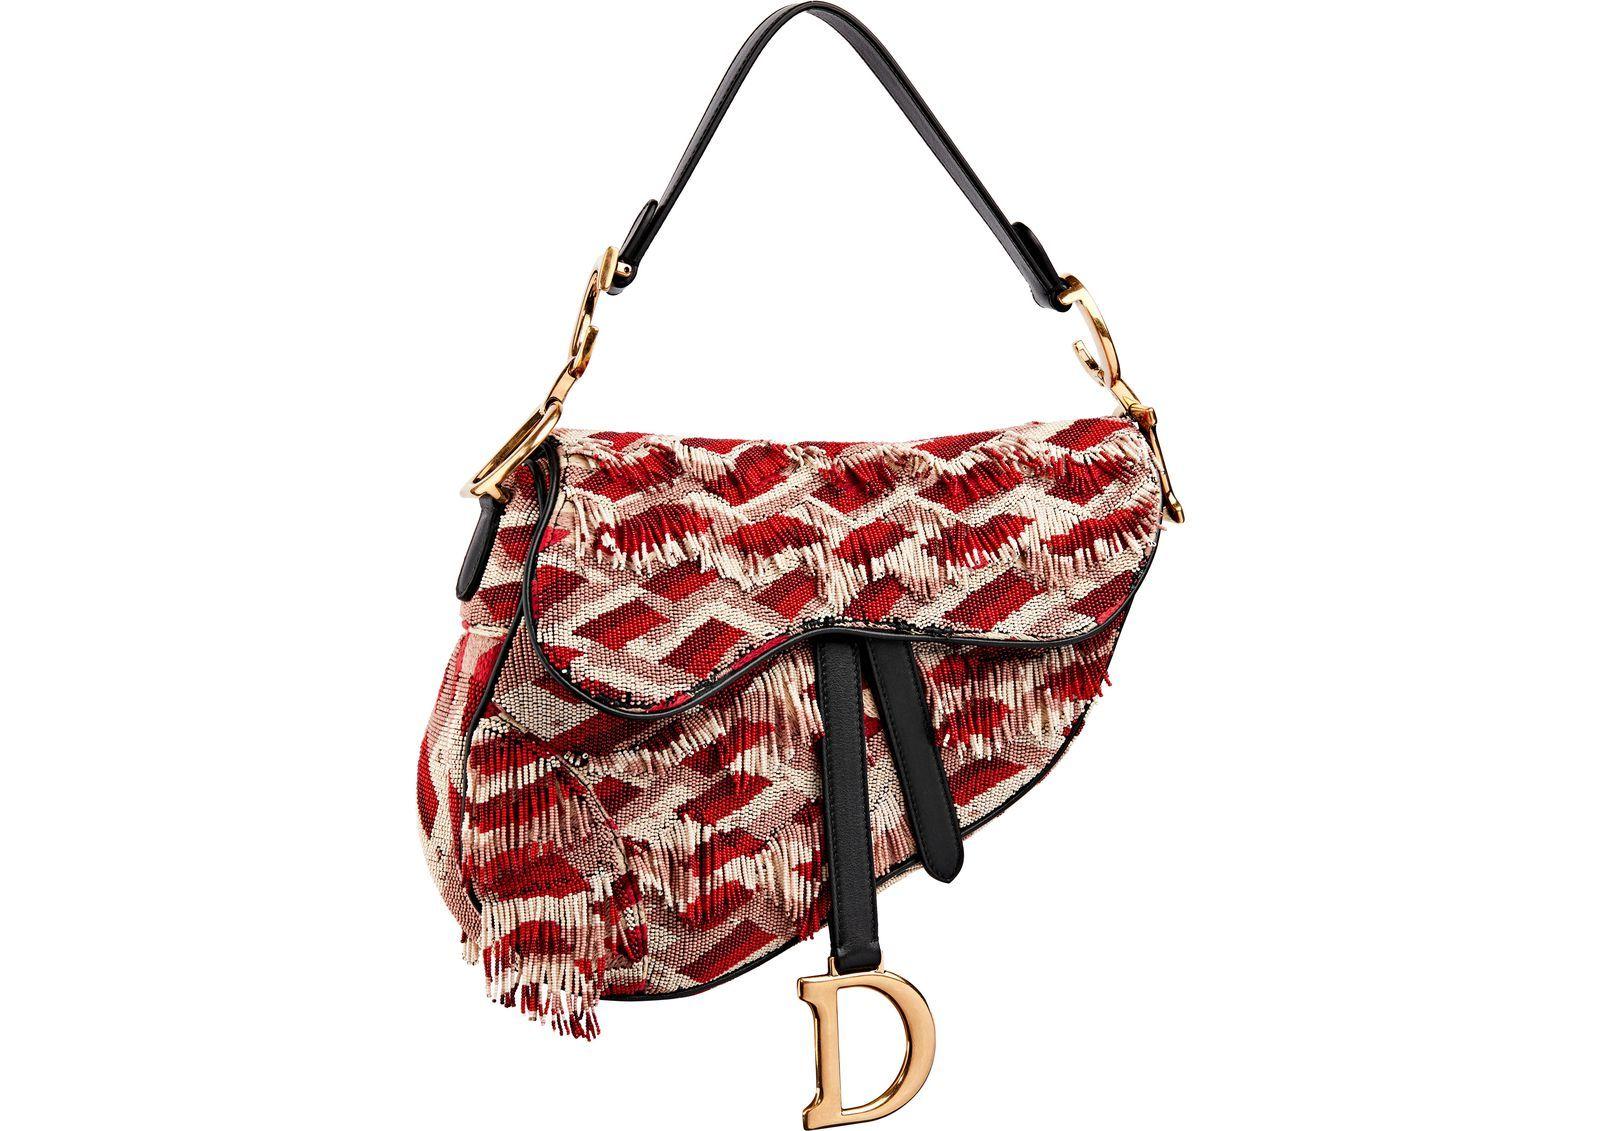 Dior S Iconic Saddle Bag Is Officially Back Dior Saddle Bag Bags Embroidered Bag